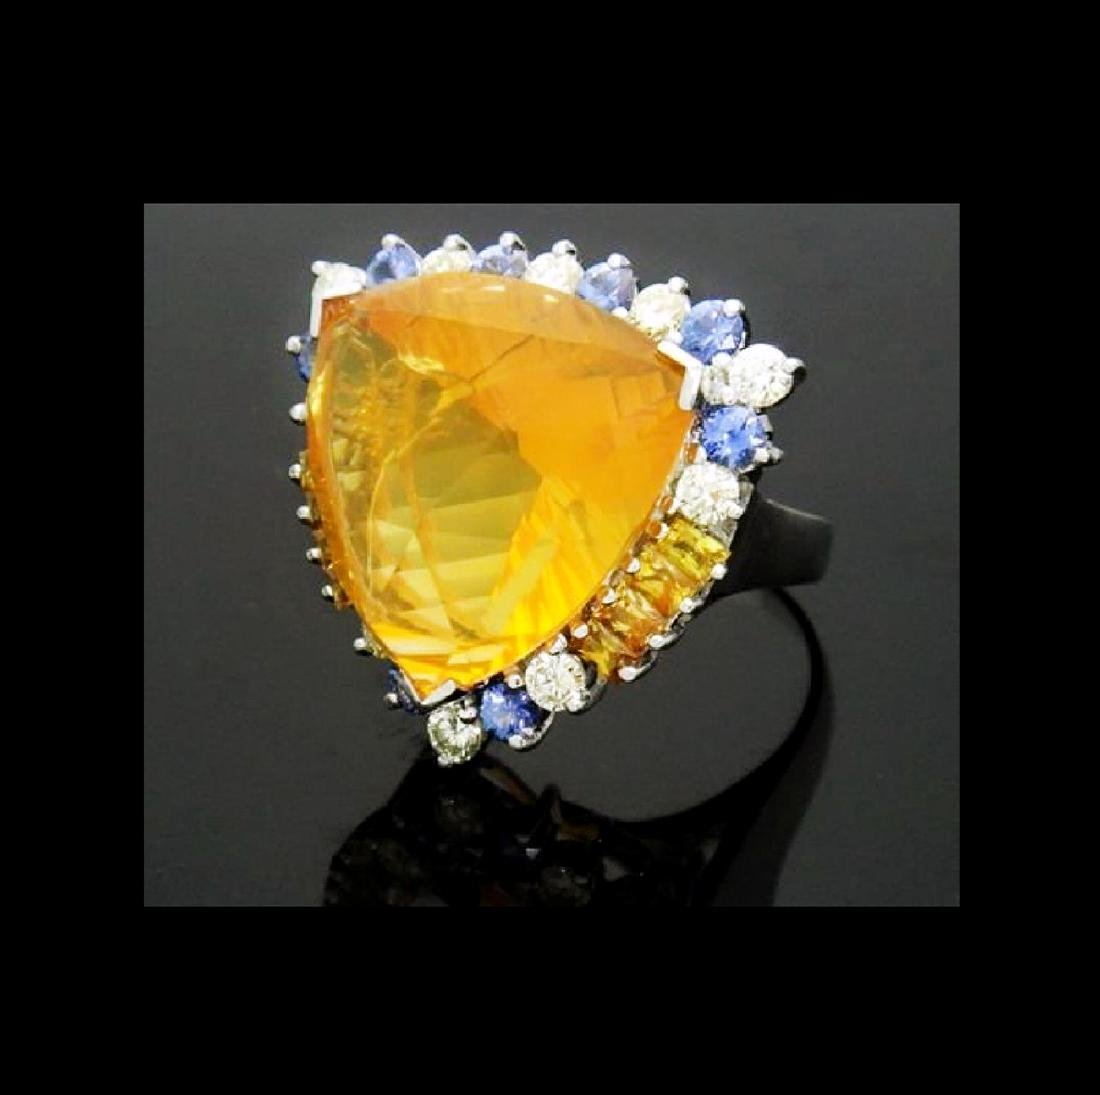 14K NATURAL OPAL 3.5CT DIAMOND TANZANITE CITRINE RING - 6